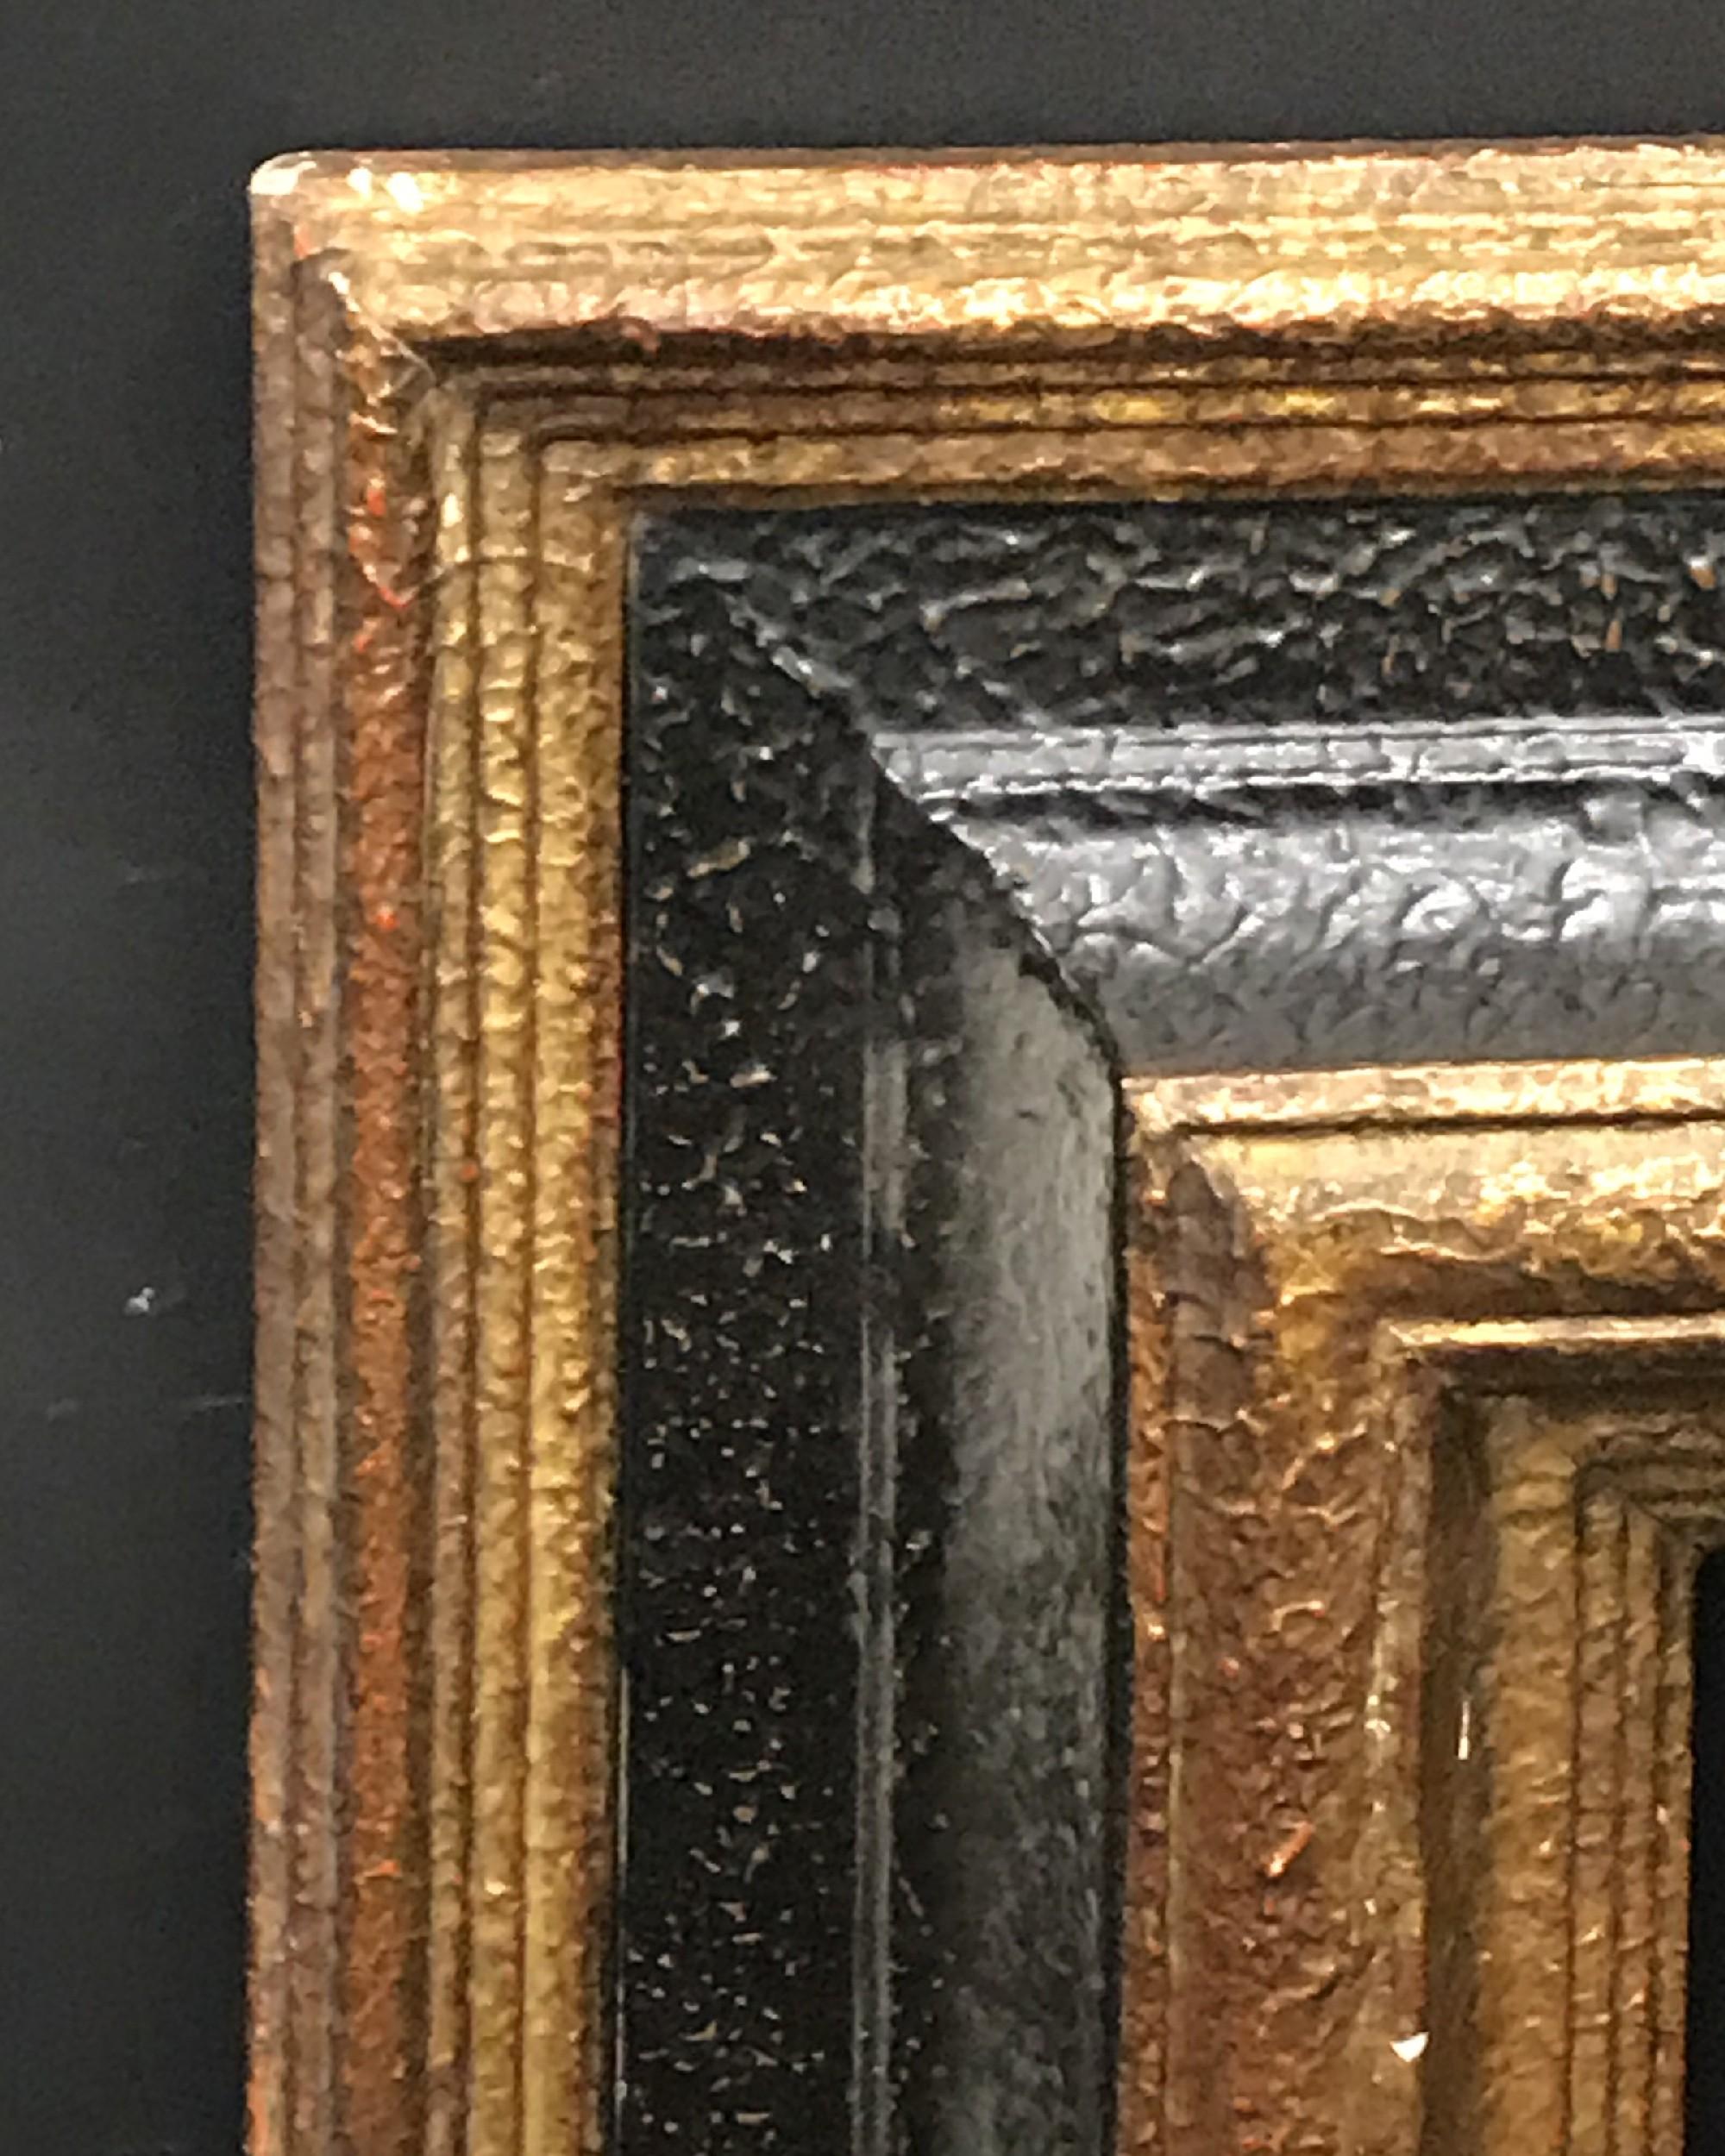 "Lot 15 - 20th Century European School. A Gilt and Black Composition Frame, 25.5"" x 23.5""."